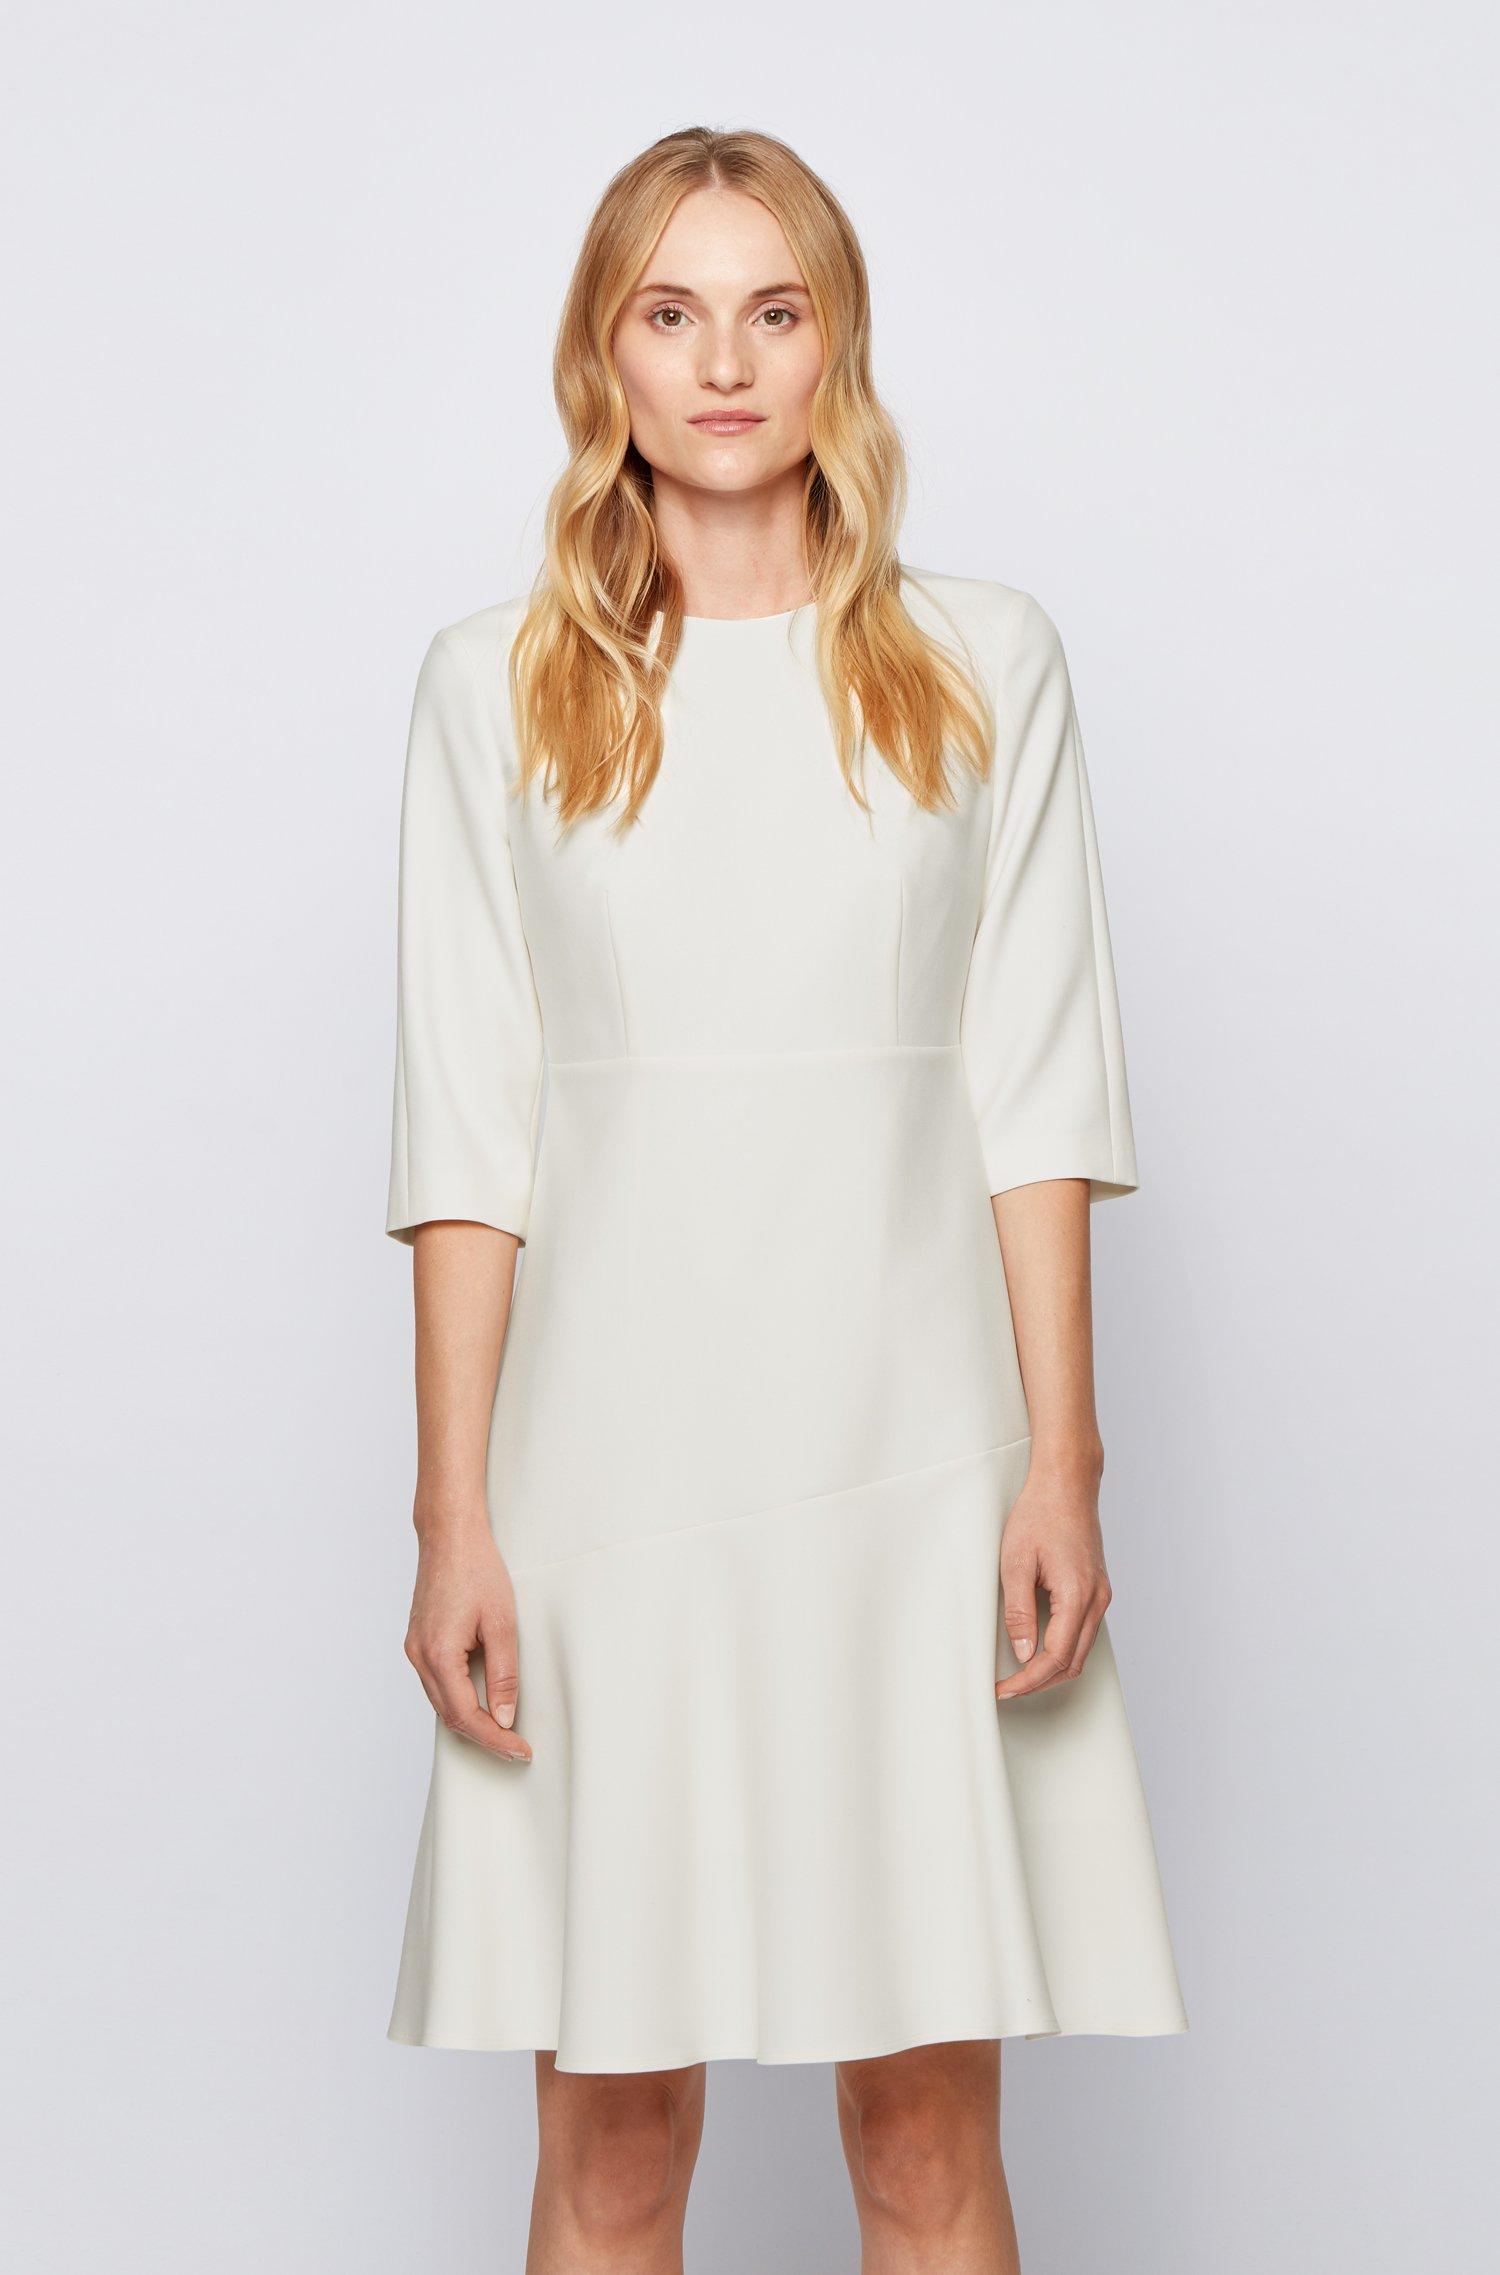 Scoop-neck A-line dress in Portuguese stretch fabric, White